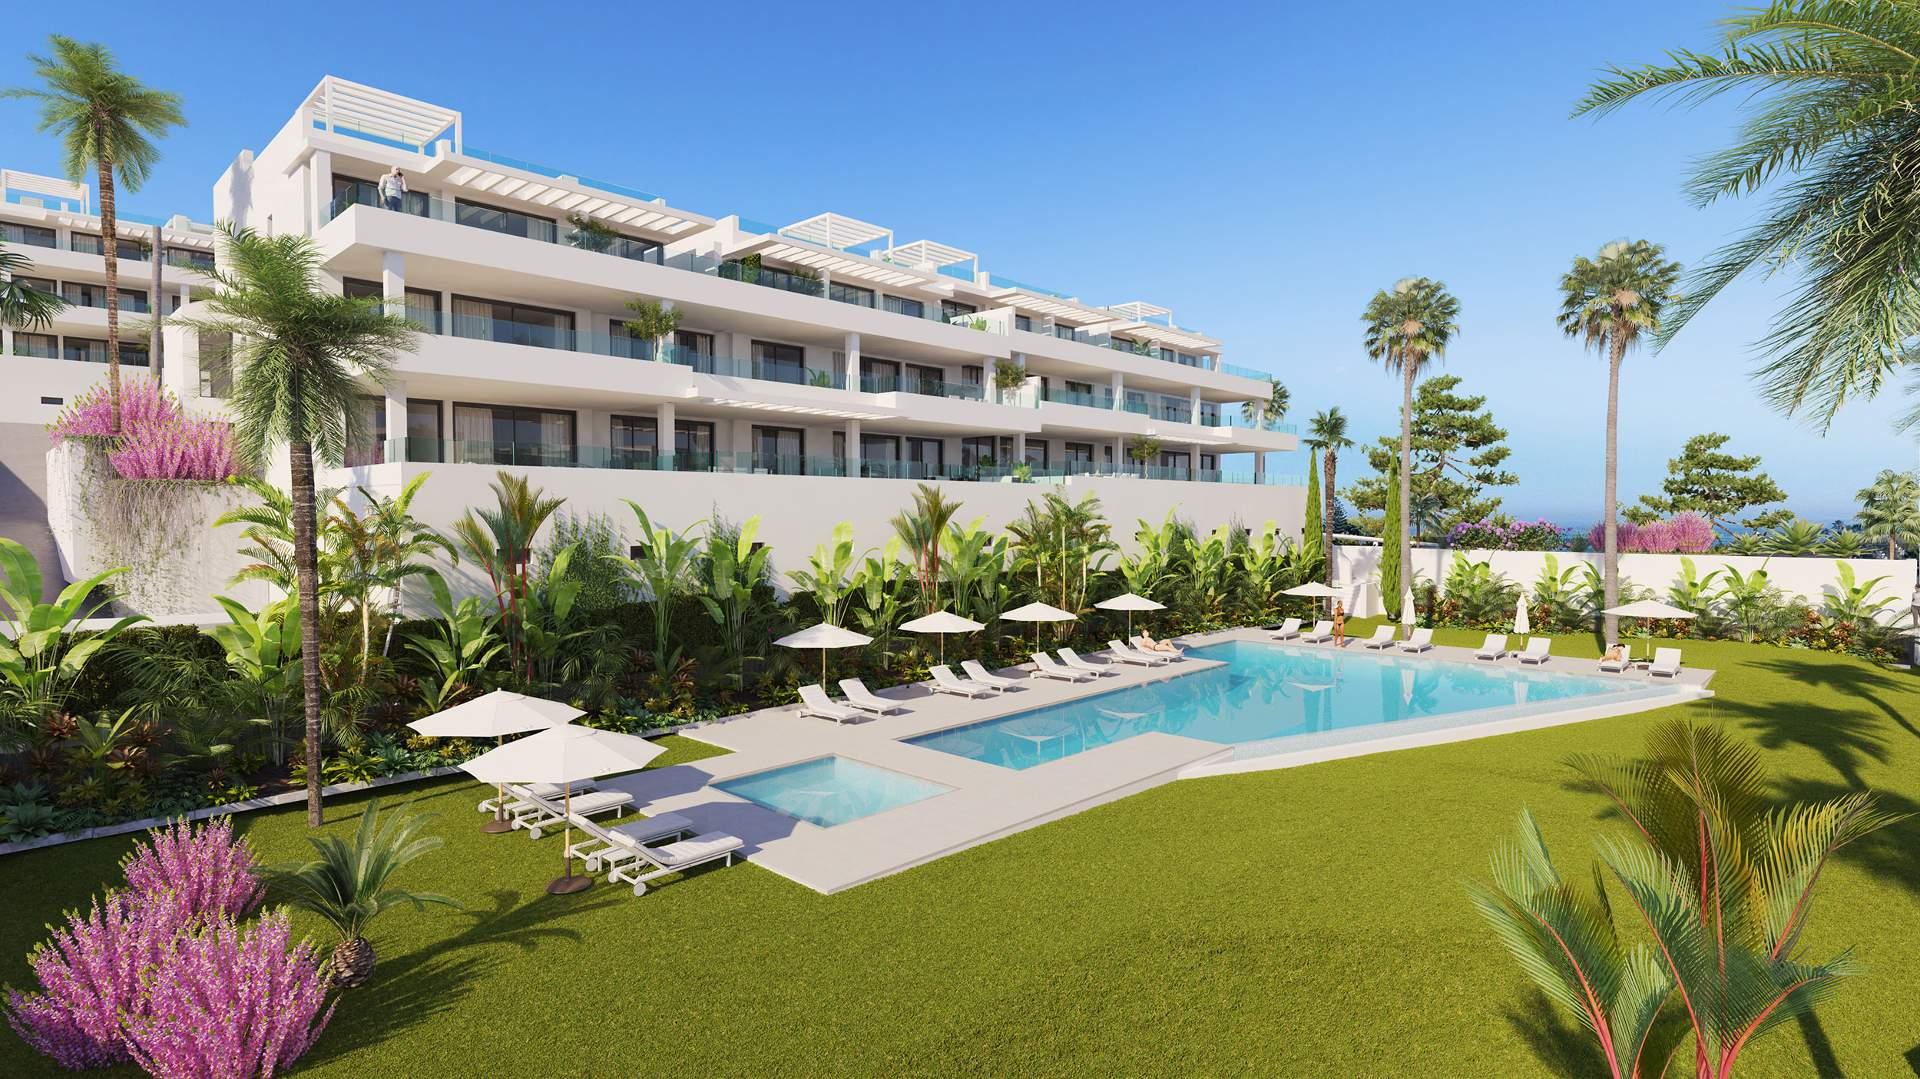 New development Las Olas Estepona ground floor apartment for sale